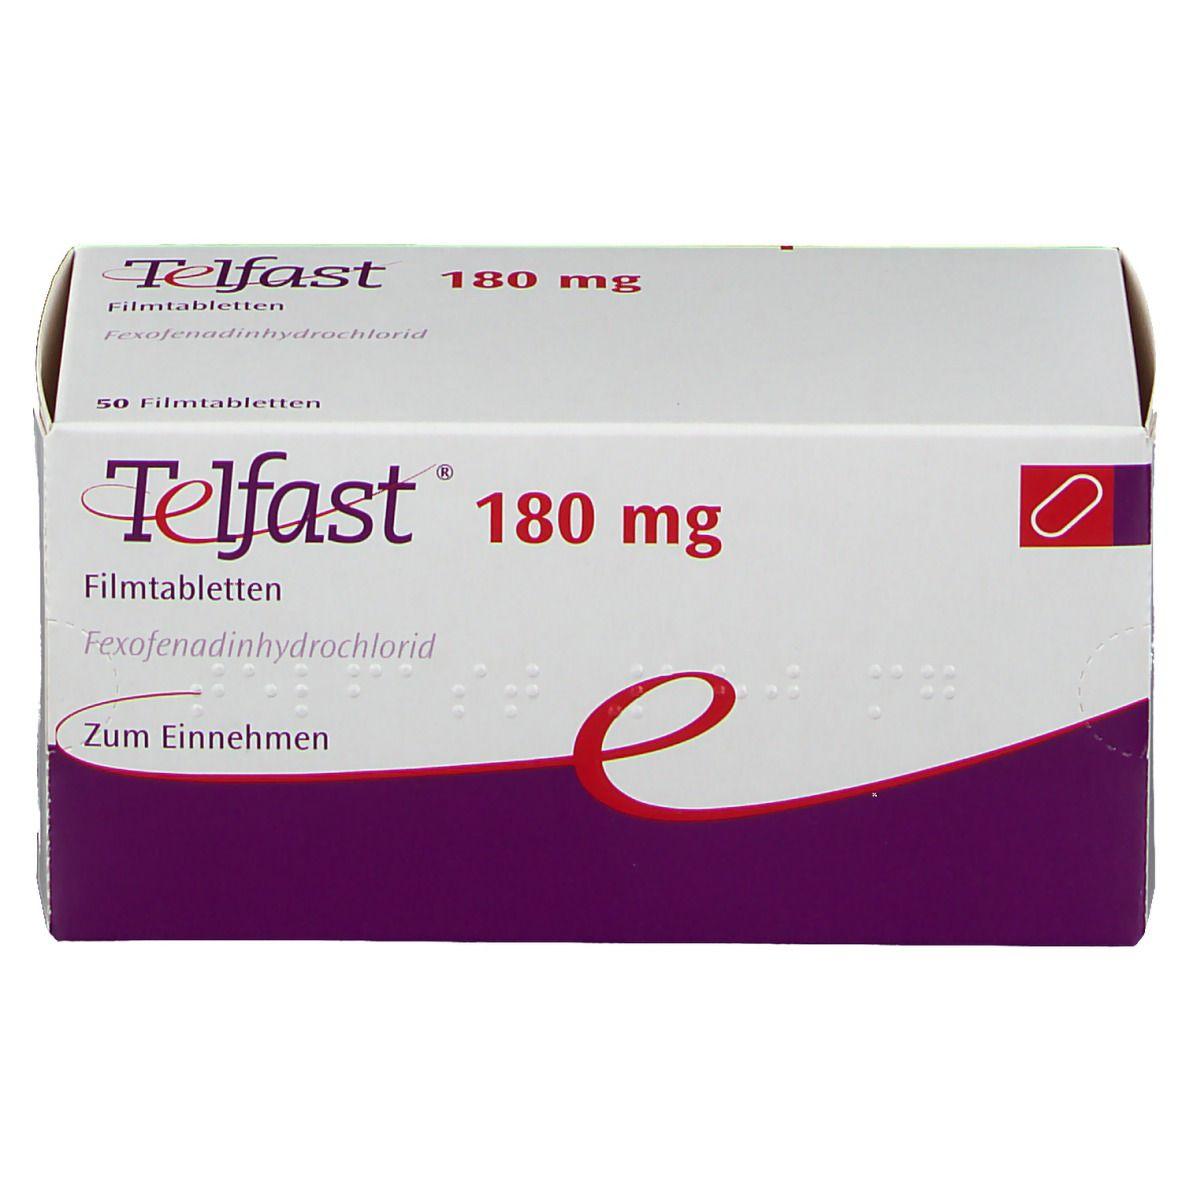 Telfast 180 mg Filmtabletten 50 St - shop-apotheke.com